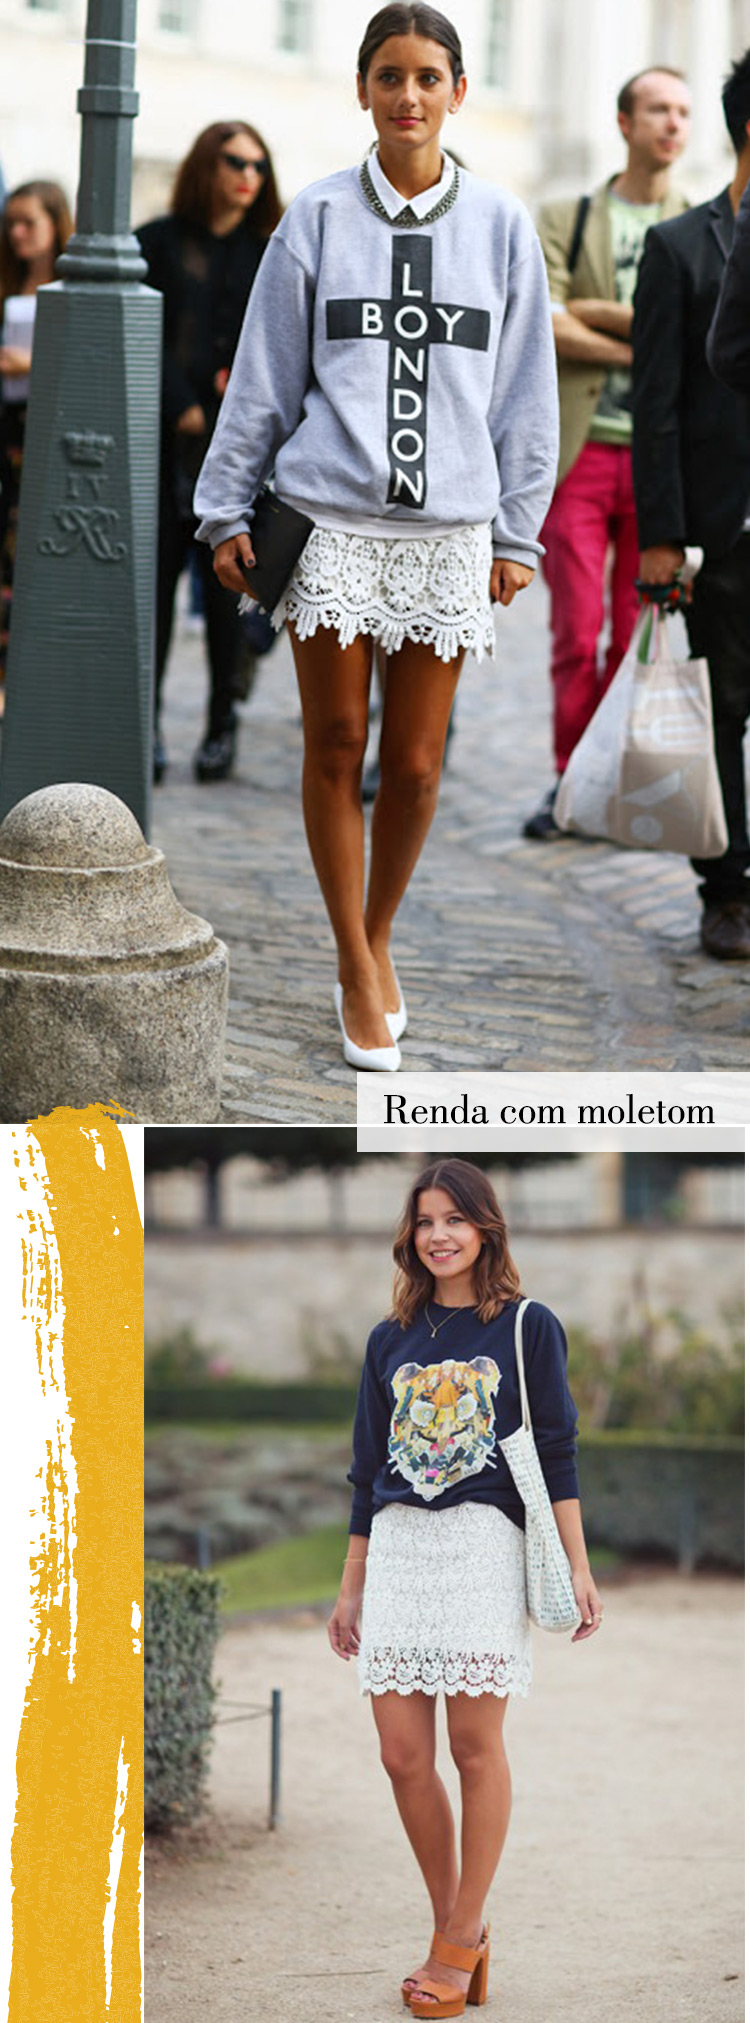 Post_rendas_03.jpg